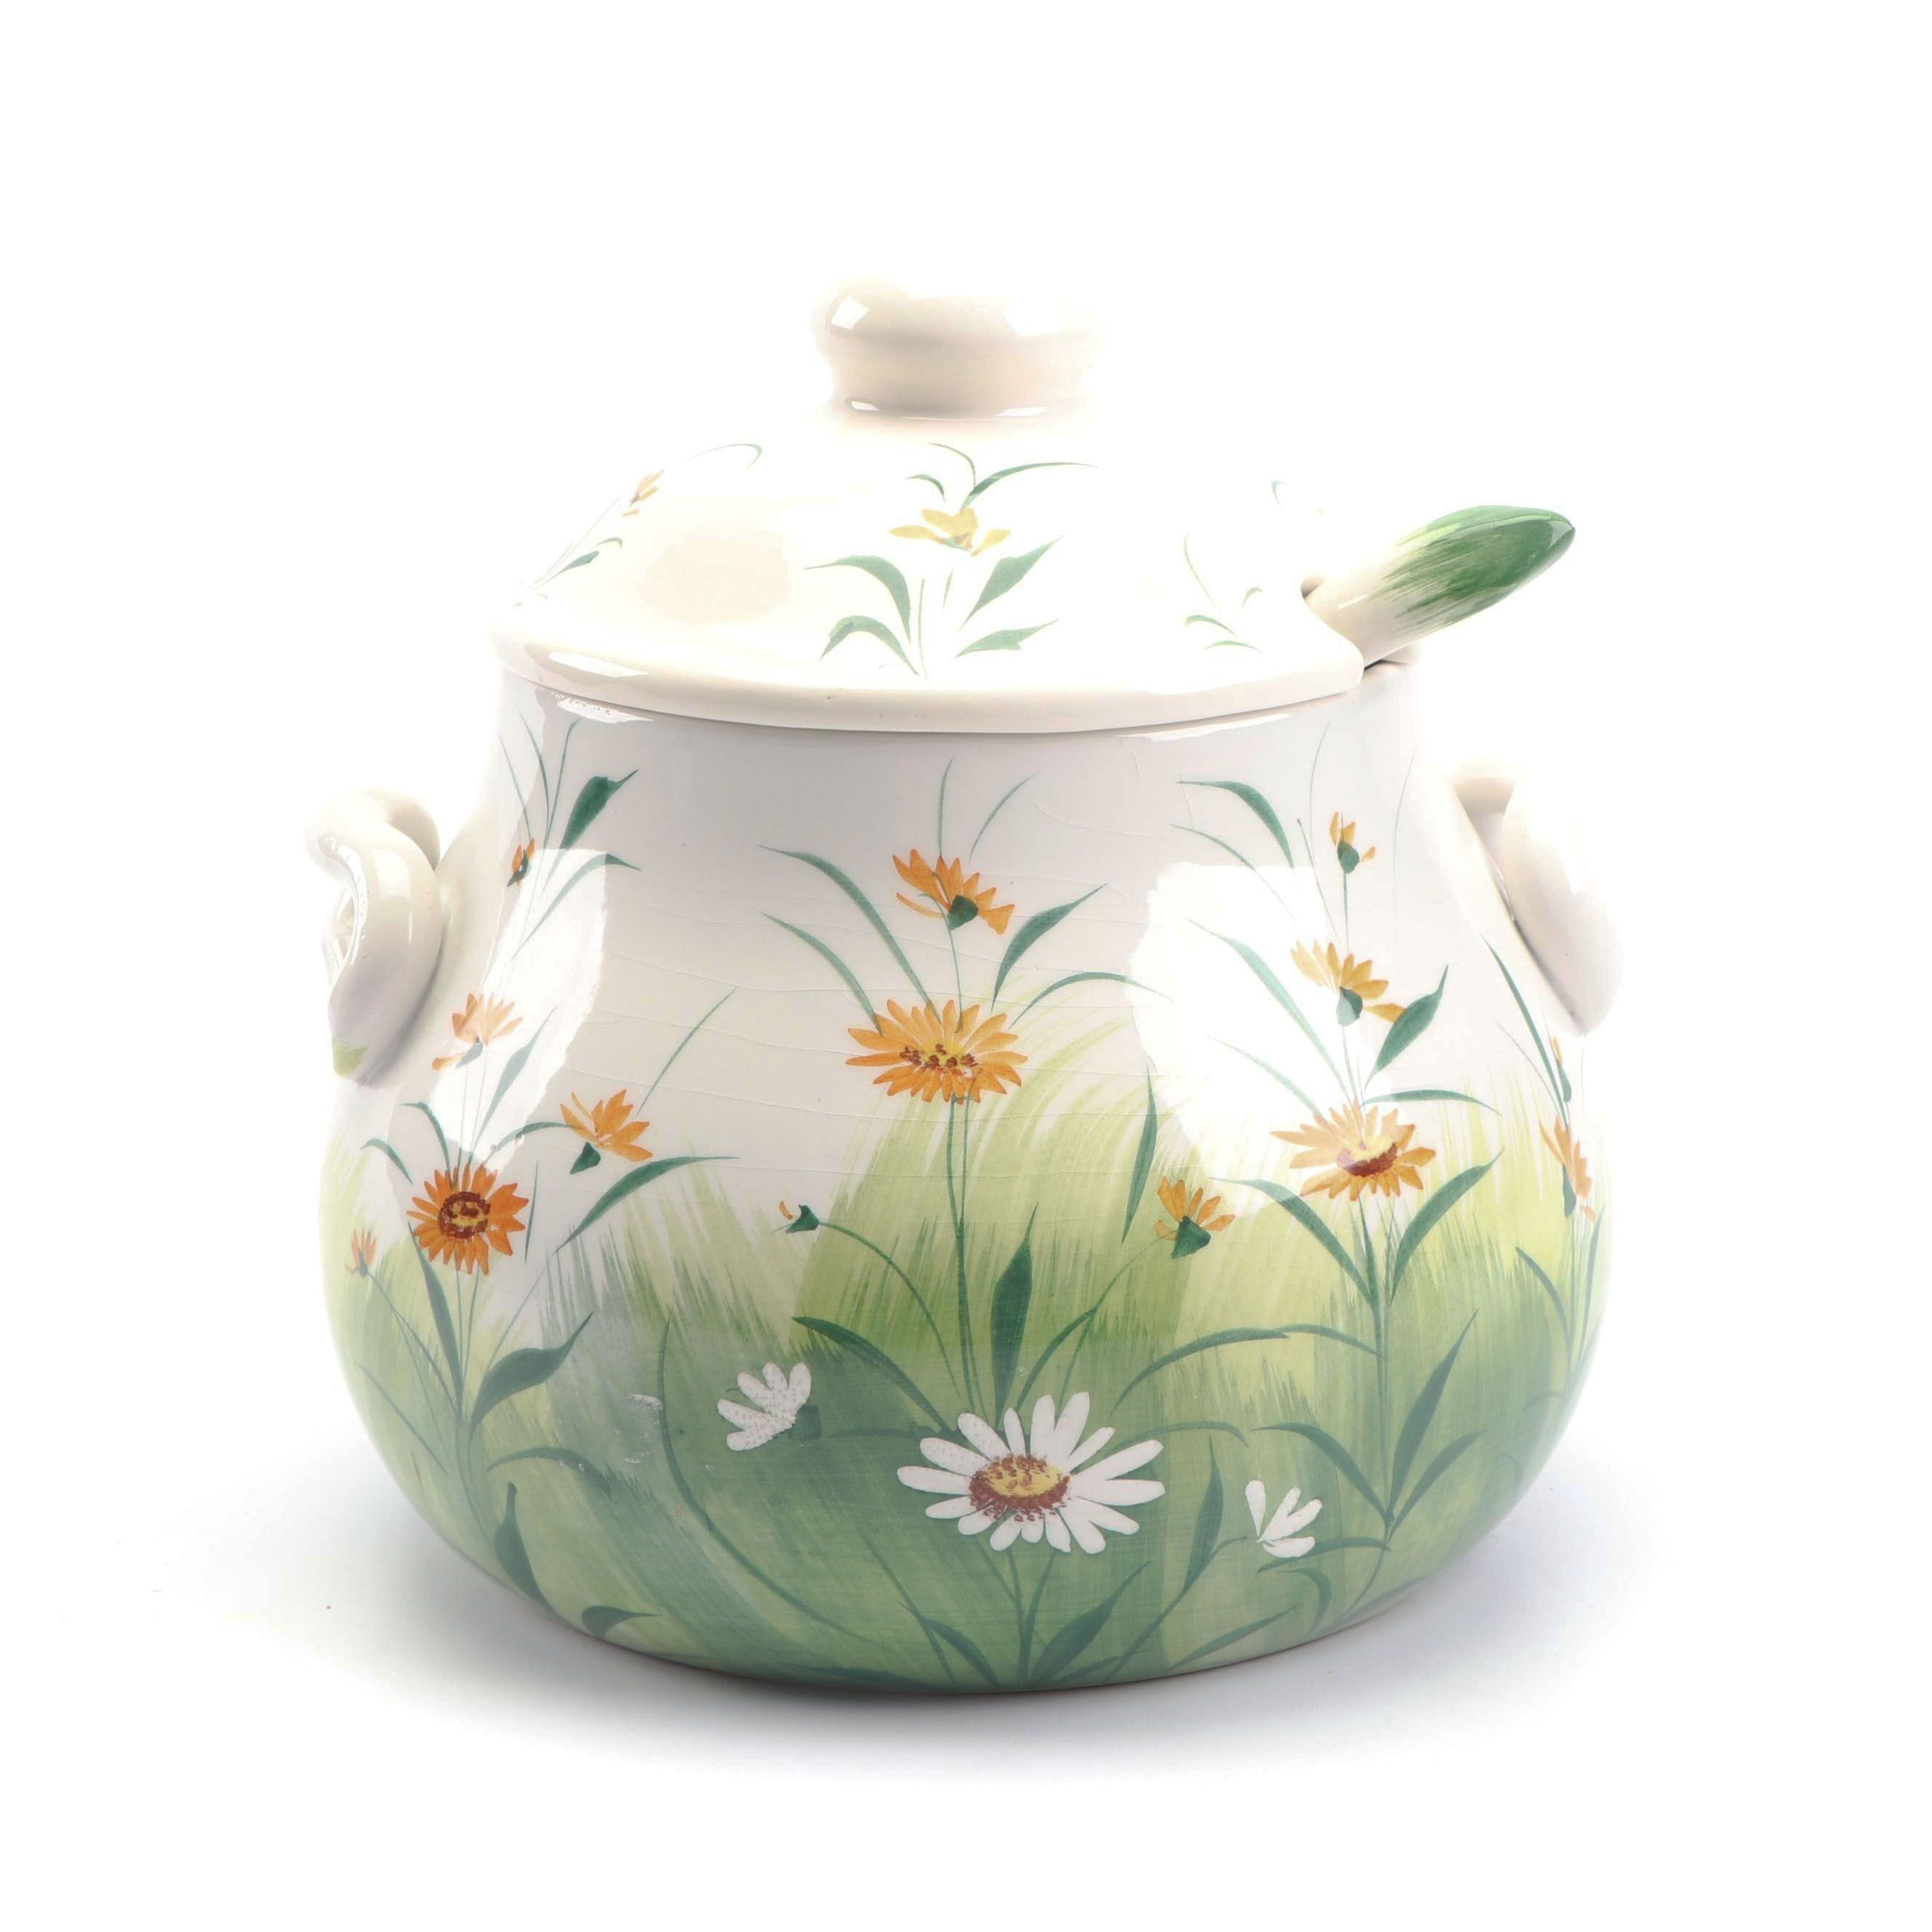 Ancora Italian Hand-Decorated Ceramic Soup Tureen